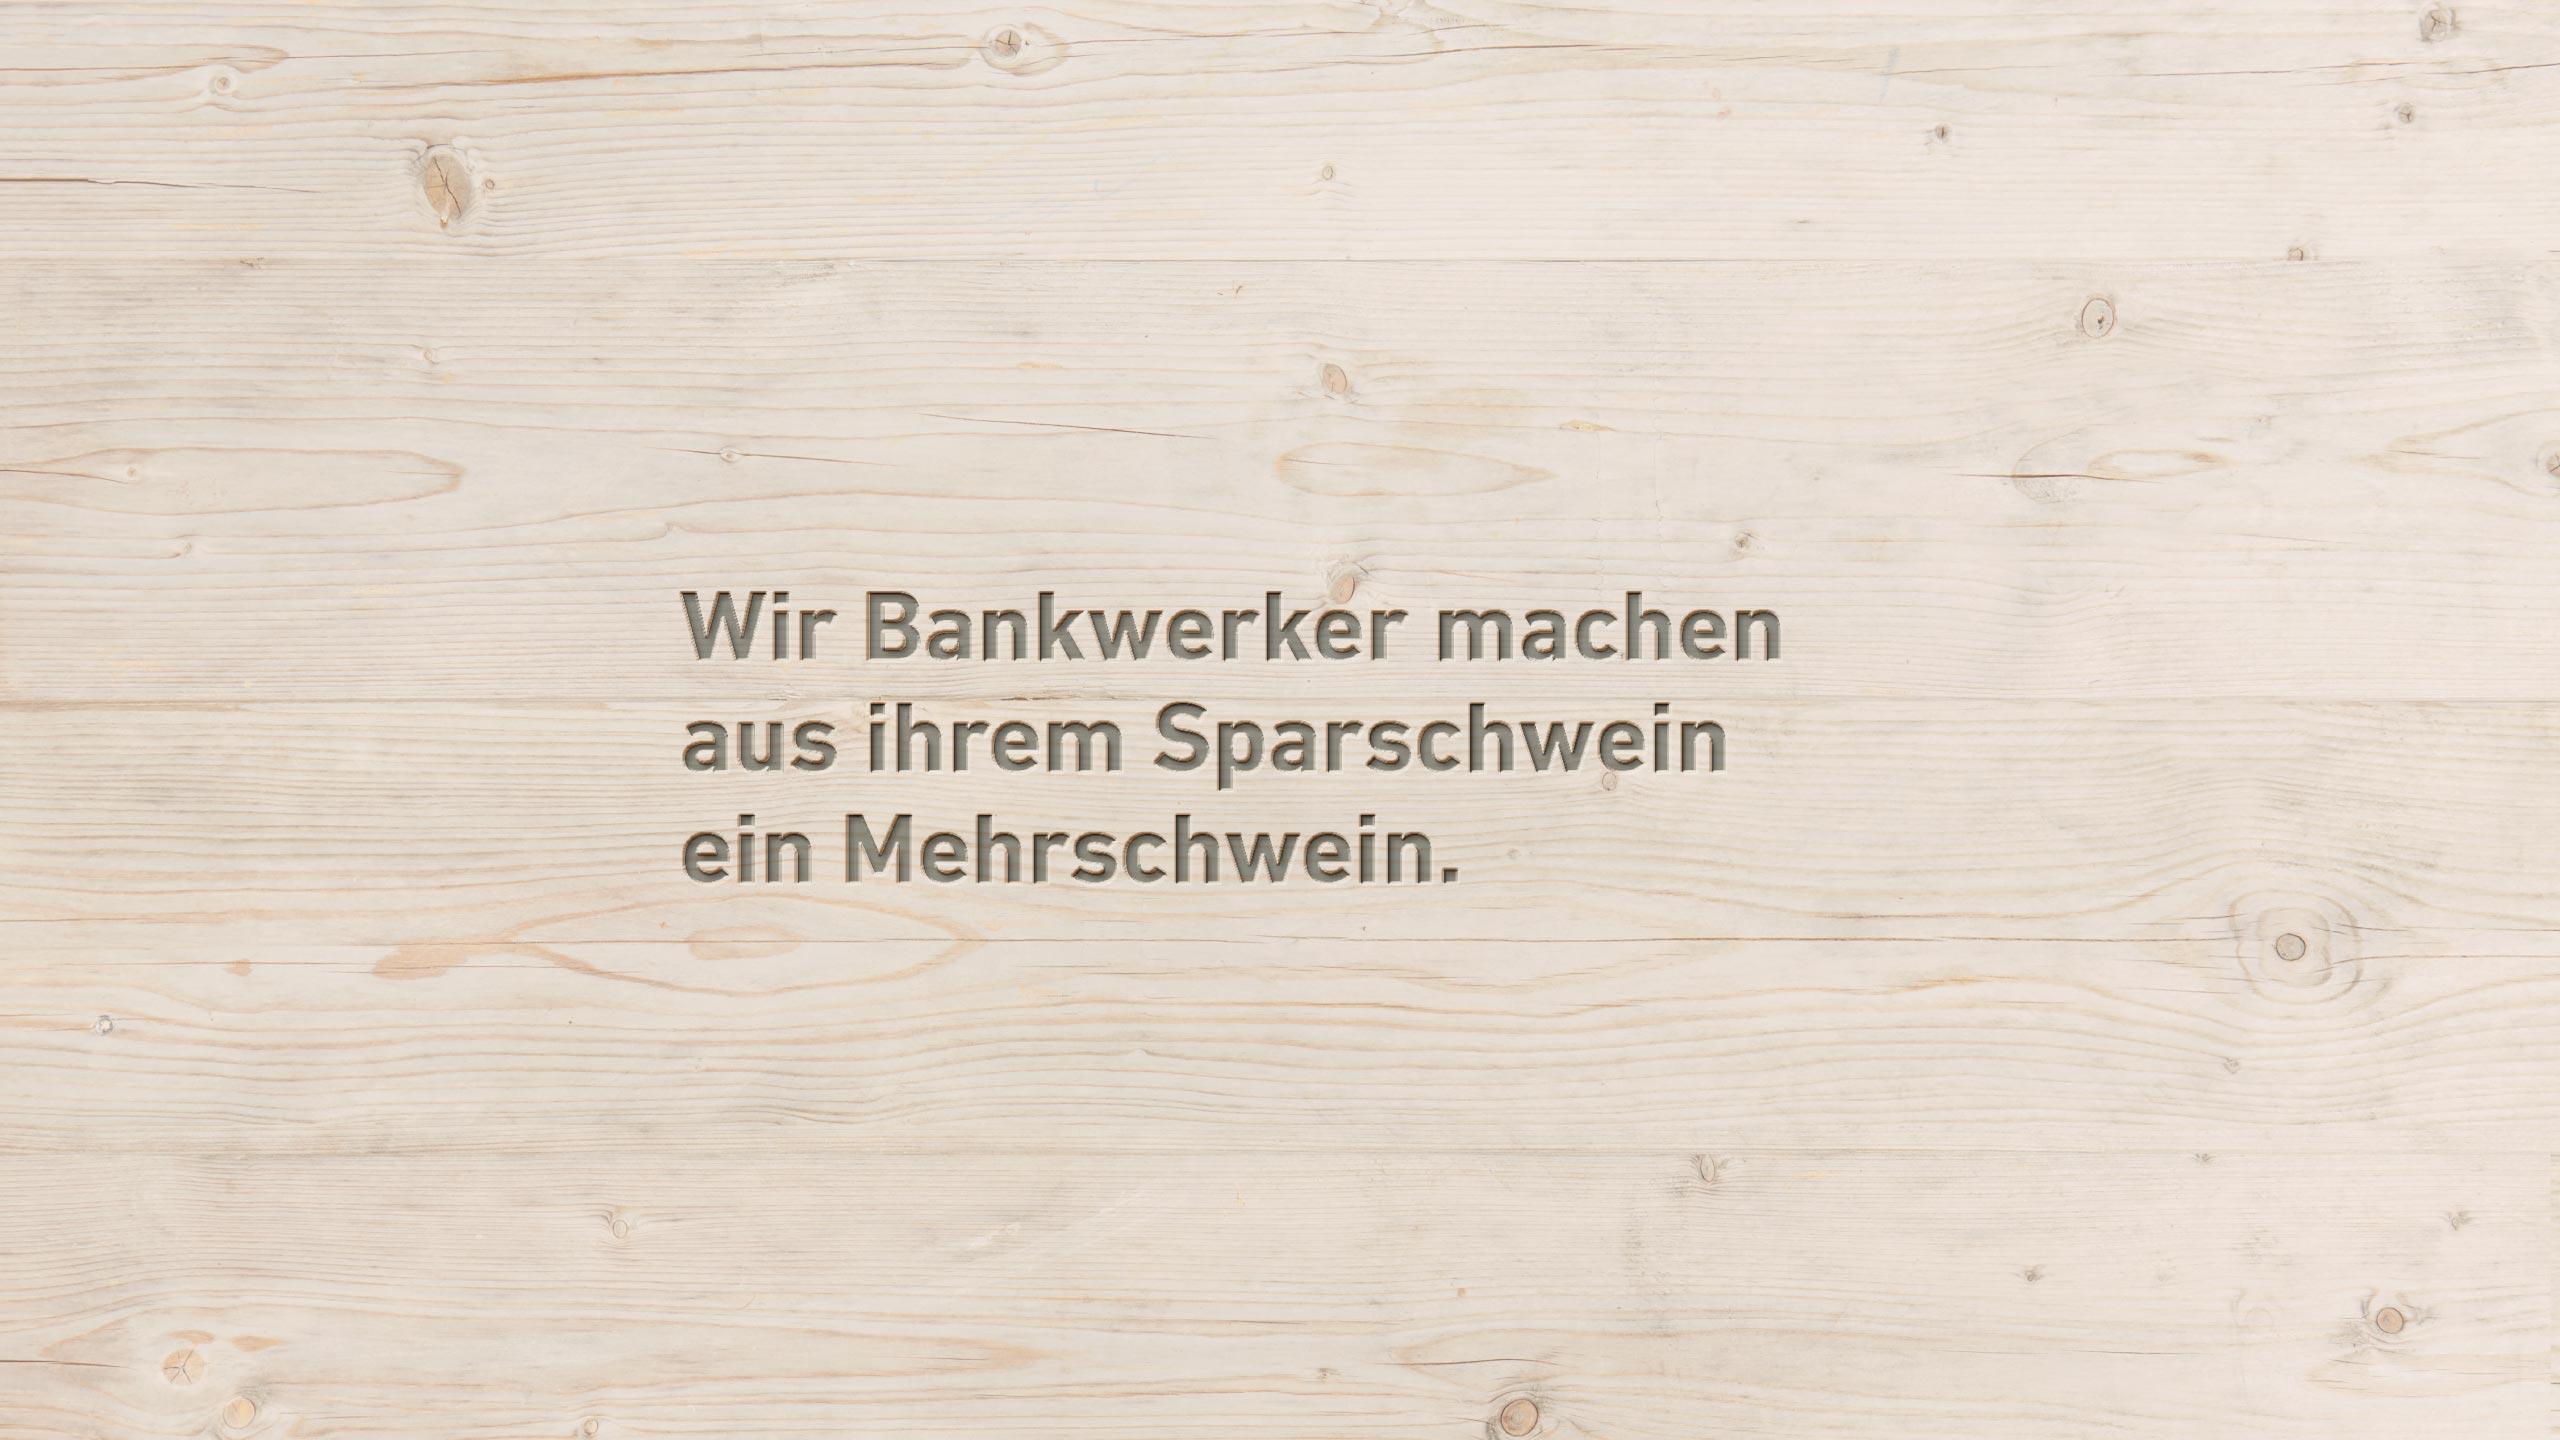 Sparkonten - Bank Thalwil - die Bankwerker